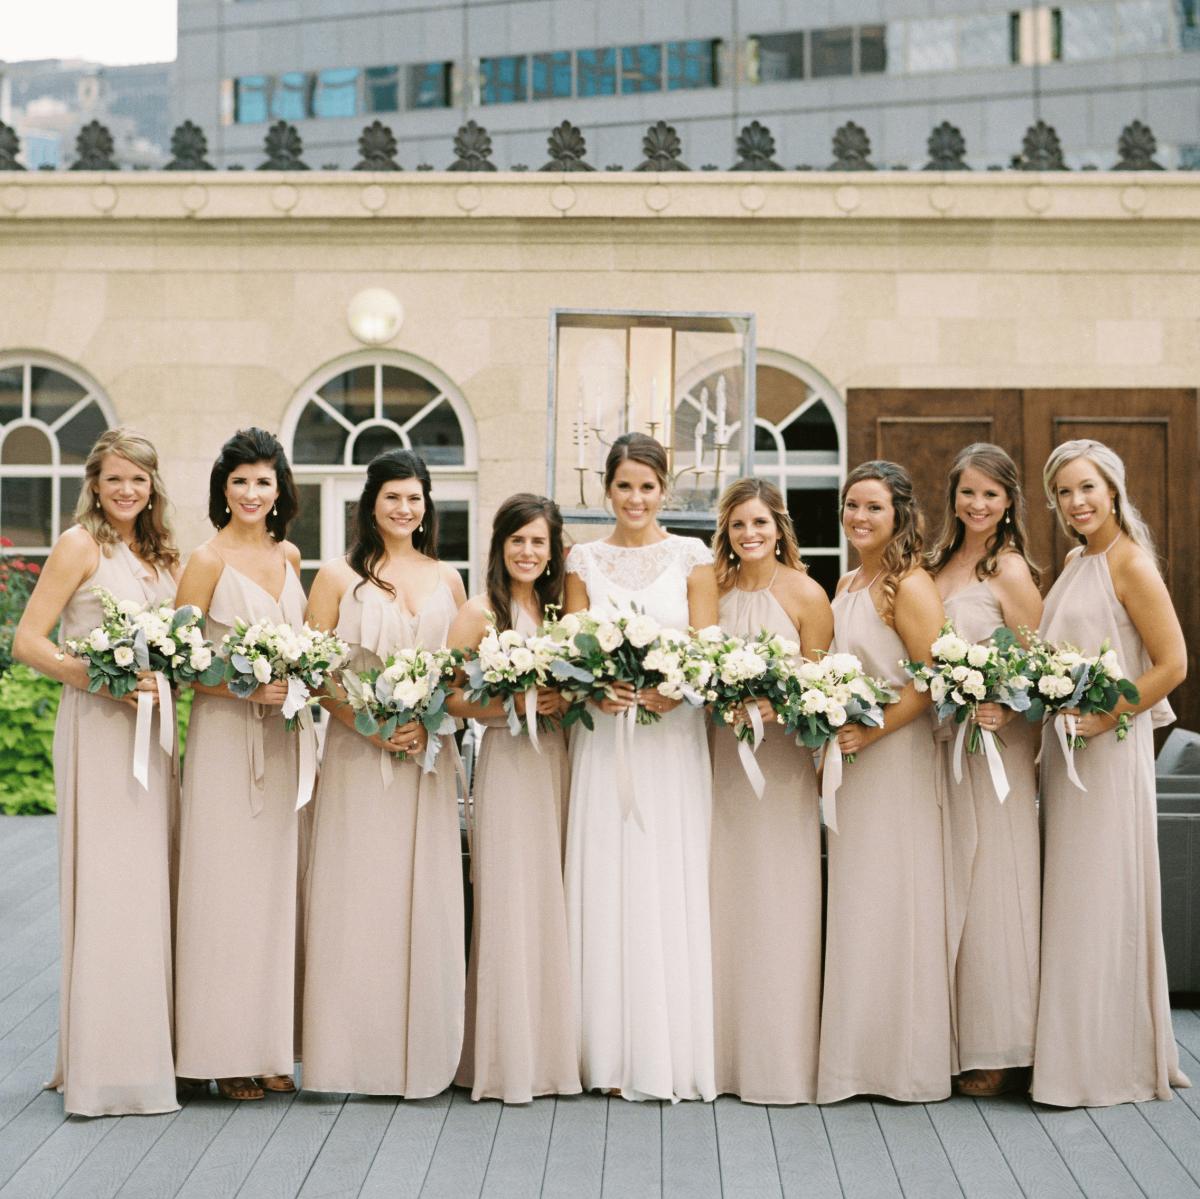 Downtown Dallas Rooftop Fulfills Wedding Fantasy For Urban